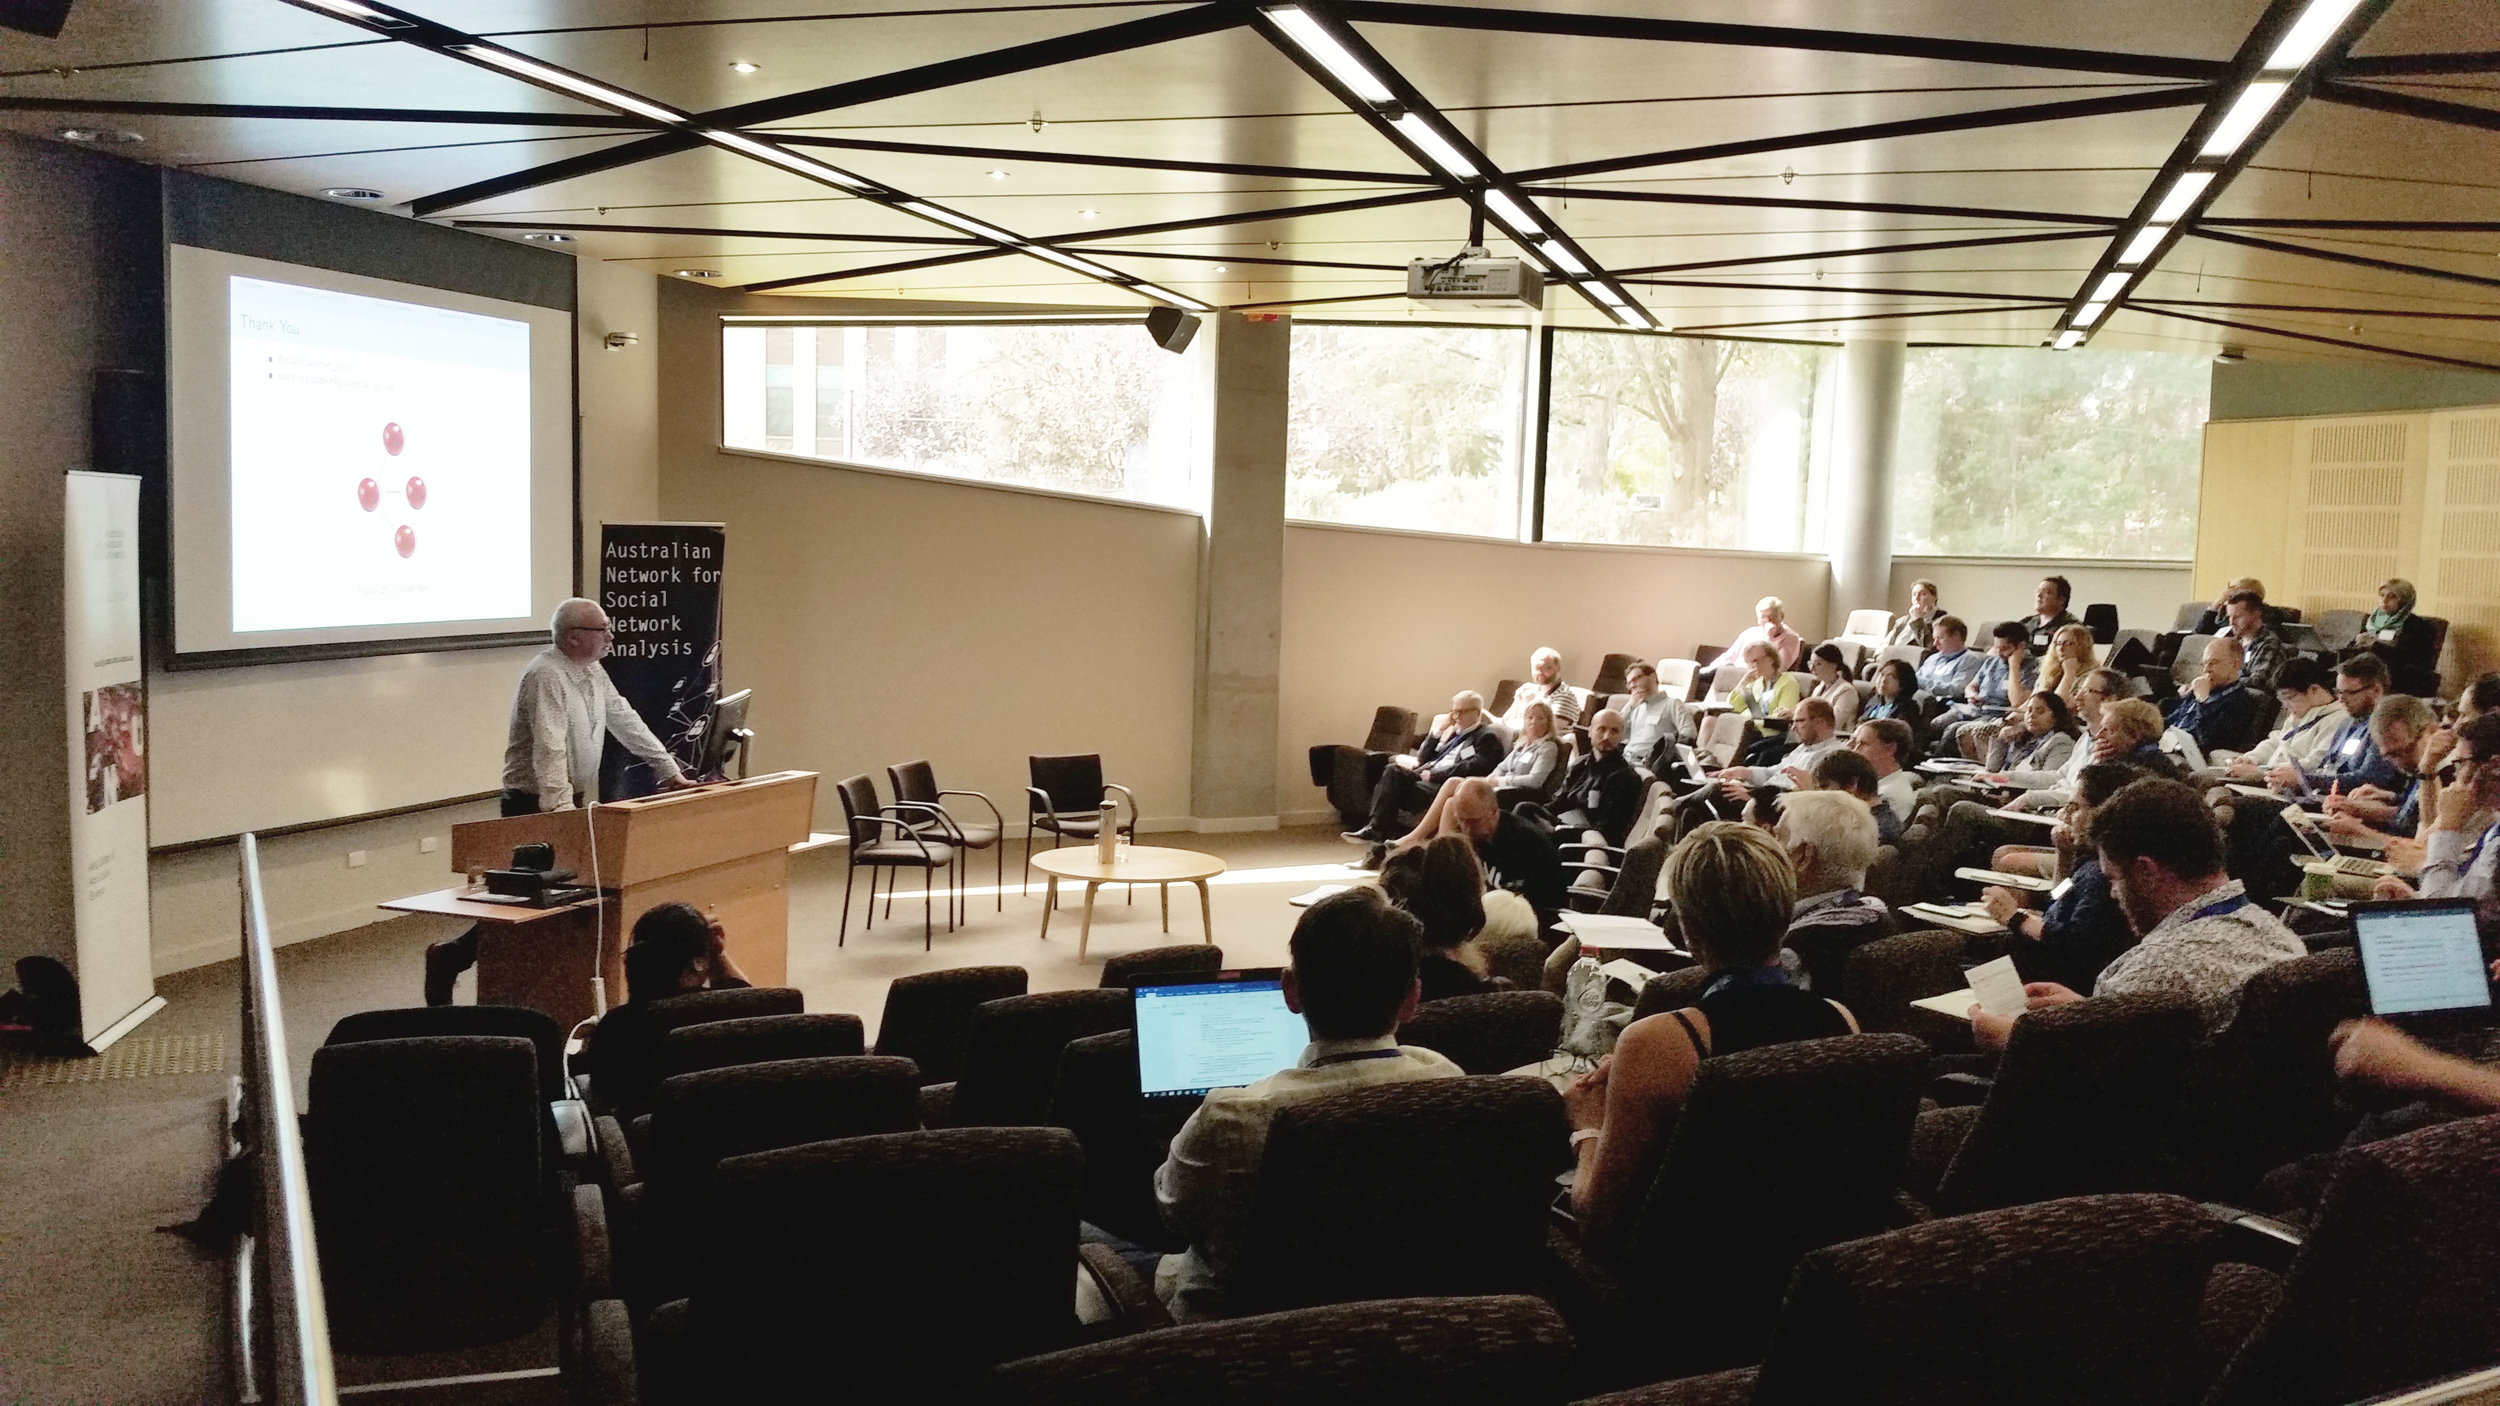 Keynote talk: Social Networks: a Multilevel Perspective